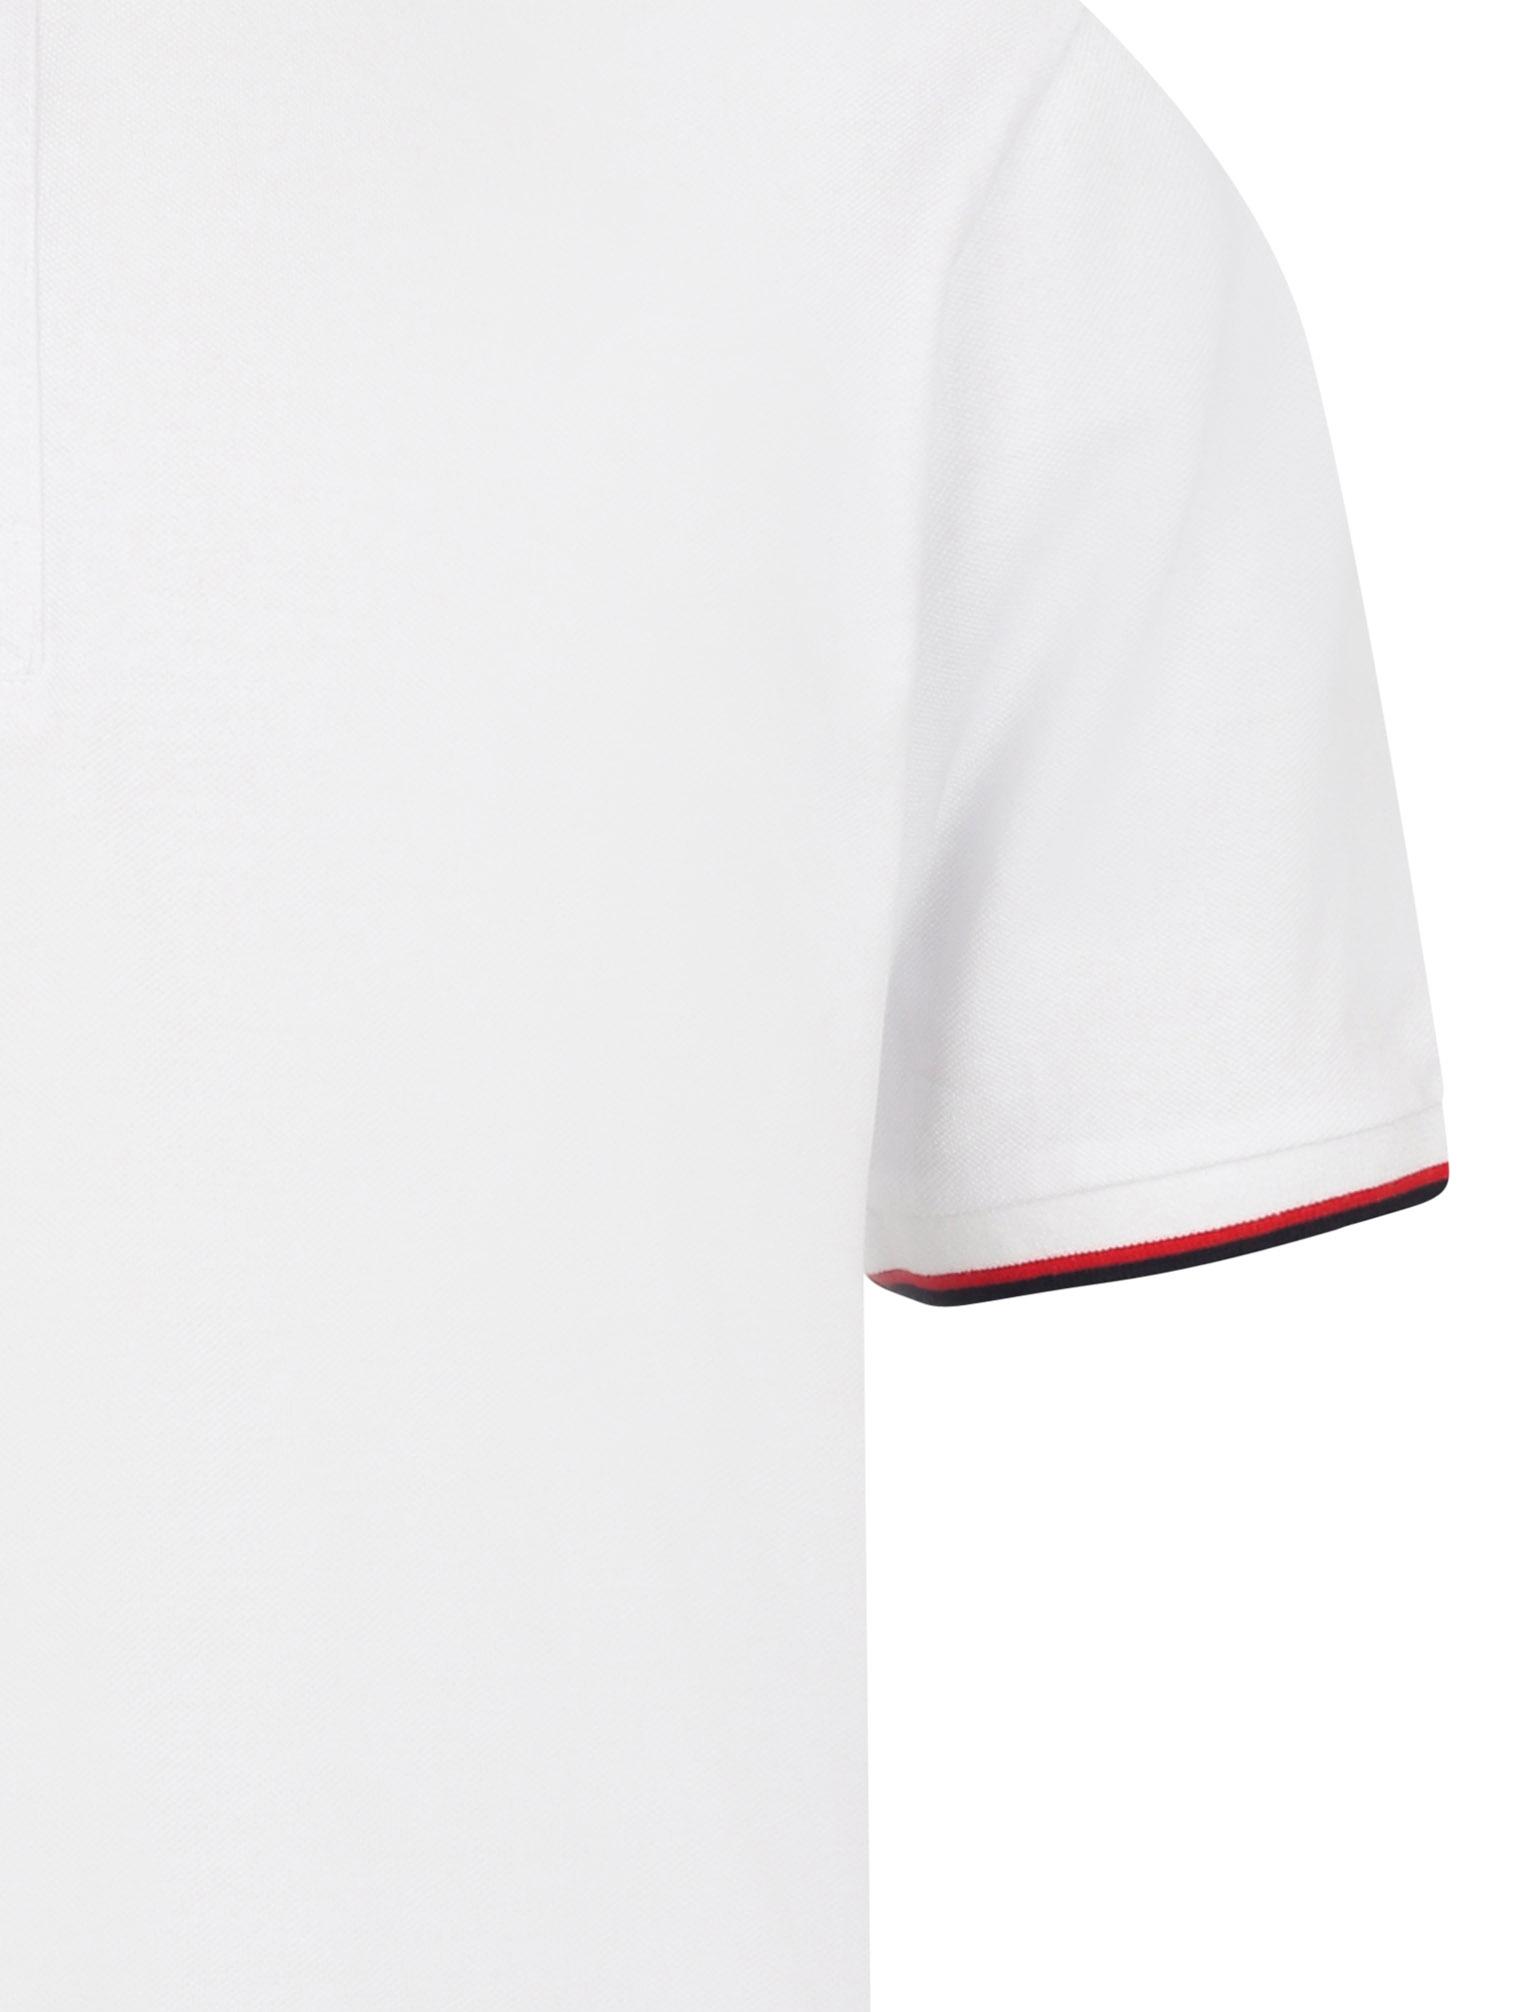 Sth-Shore-Mens-Plain-Polo-Shirt-100-Pique-Cotton-T-Shirt-Top-Collar-Size-M-XXL thumbnail 9